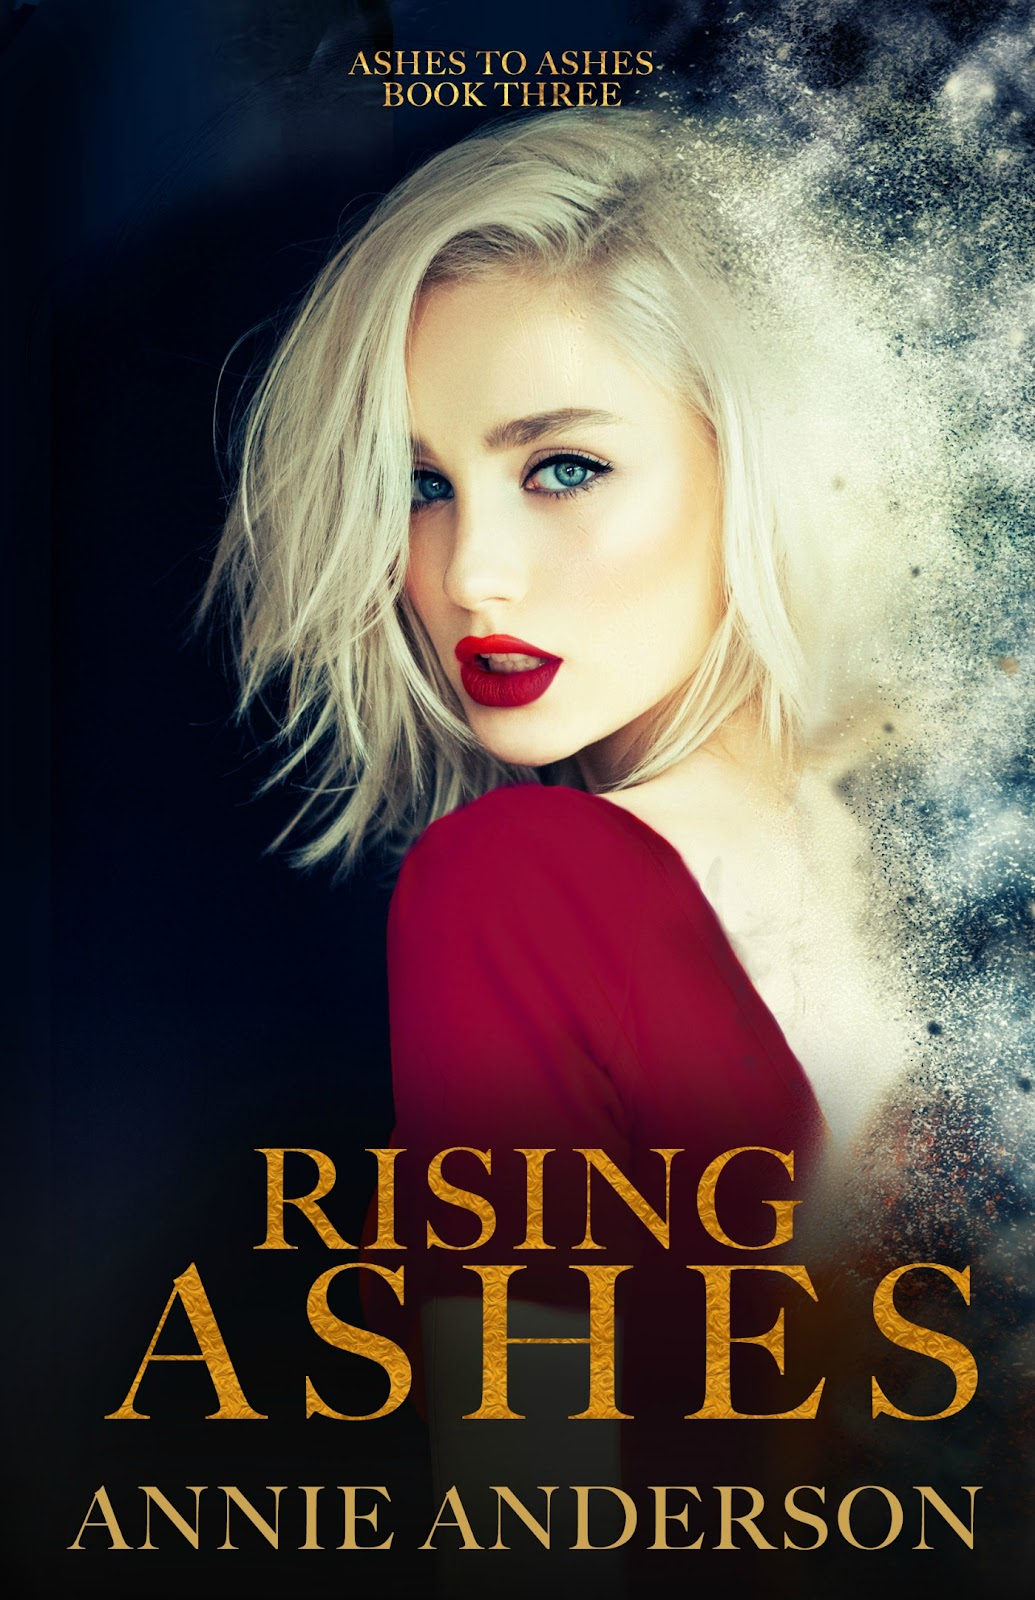 RisingAshesebook.jpg